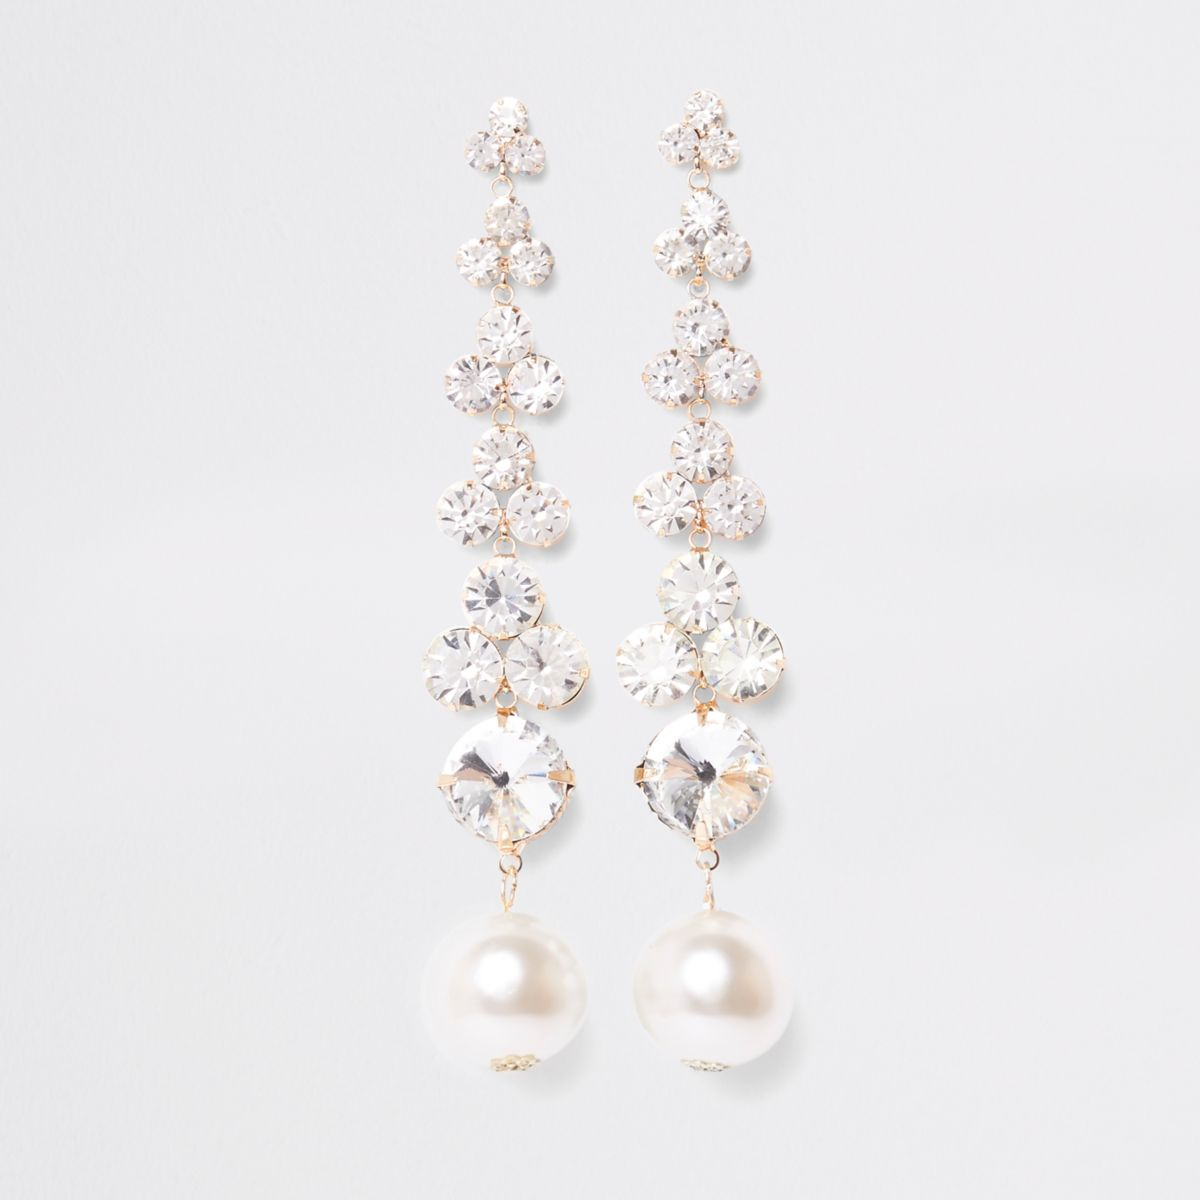 Gold tone diamante pearl drop earrings